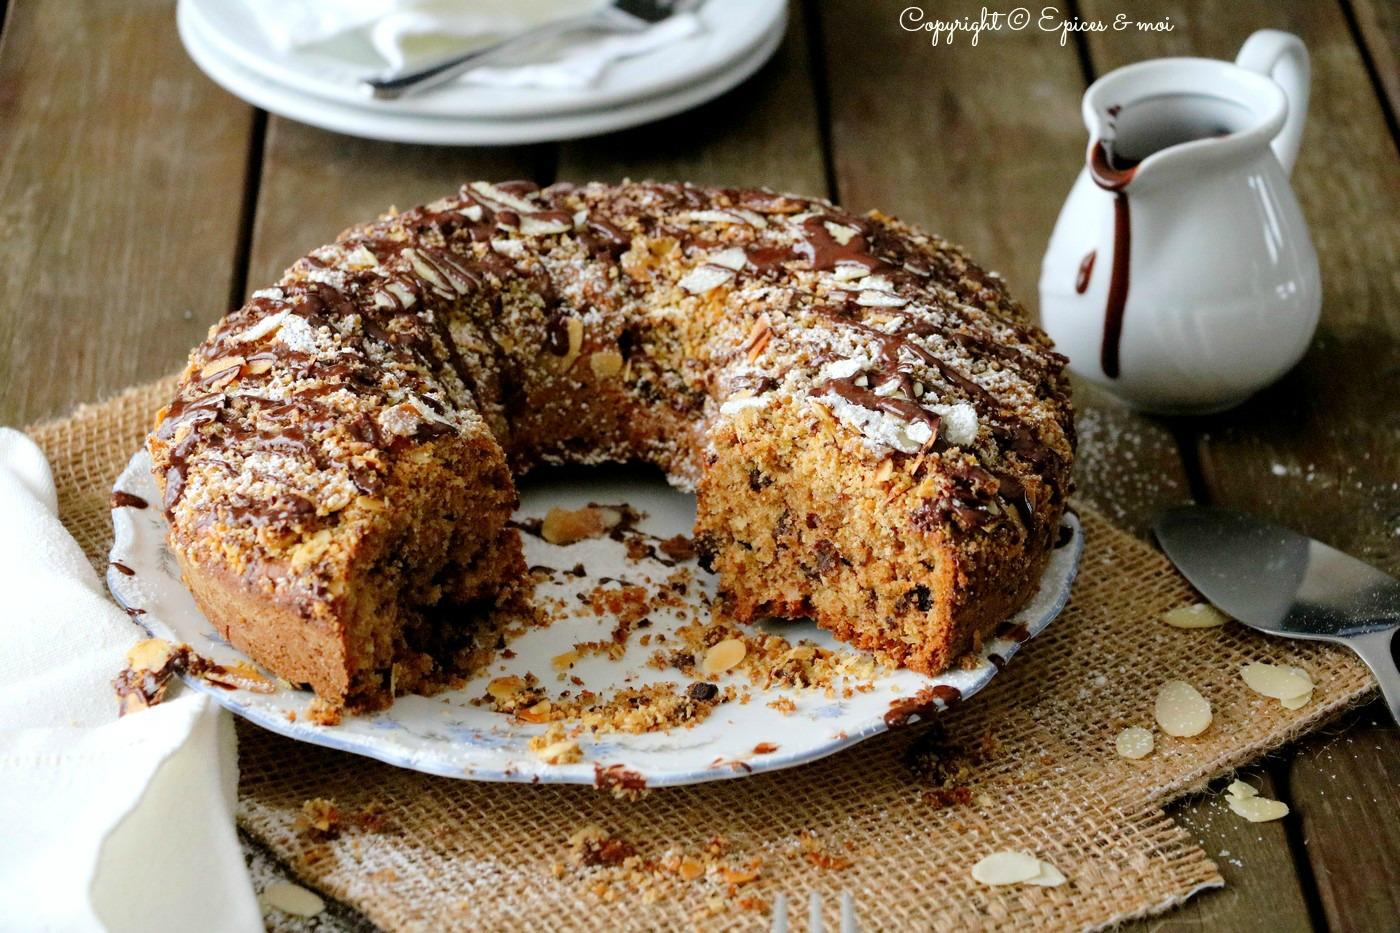 Epices & moi Gâteau choco amandes 5